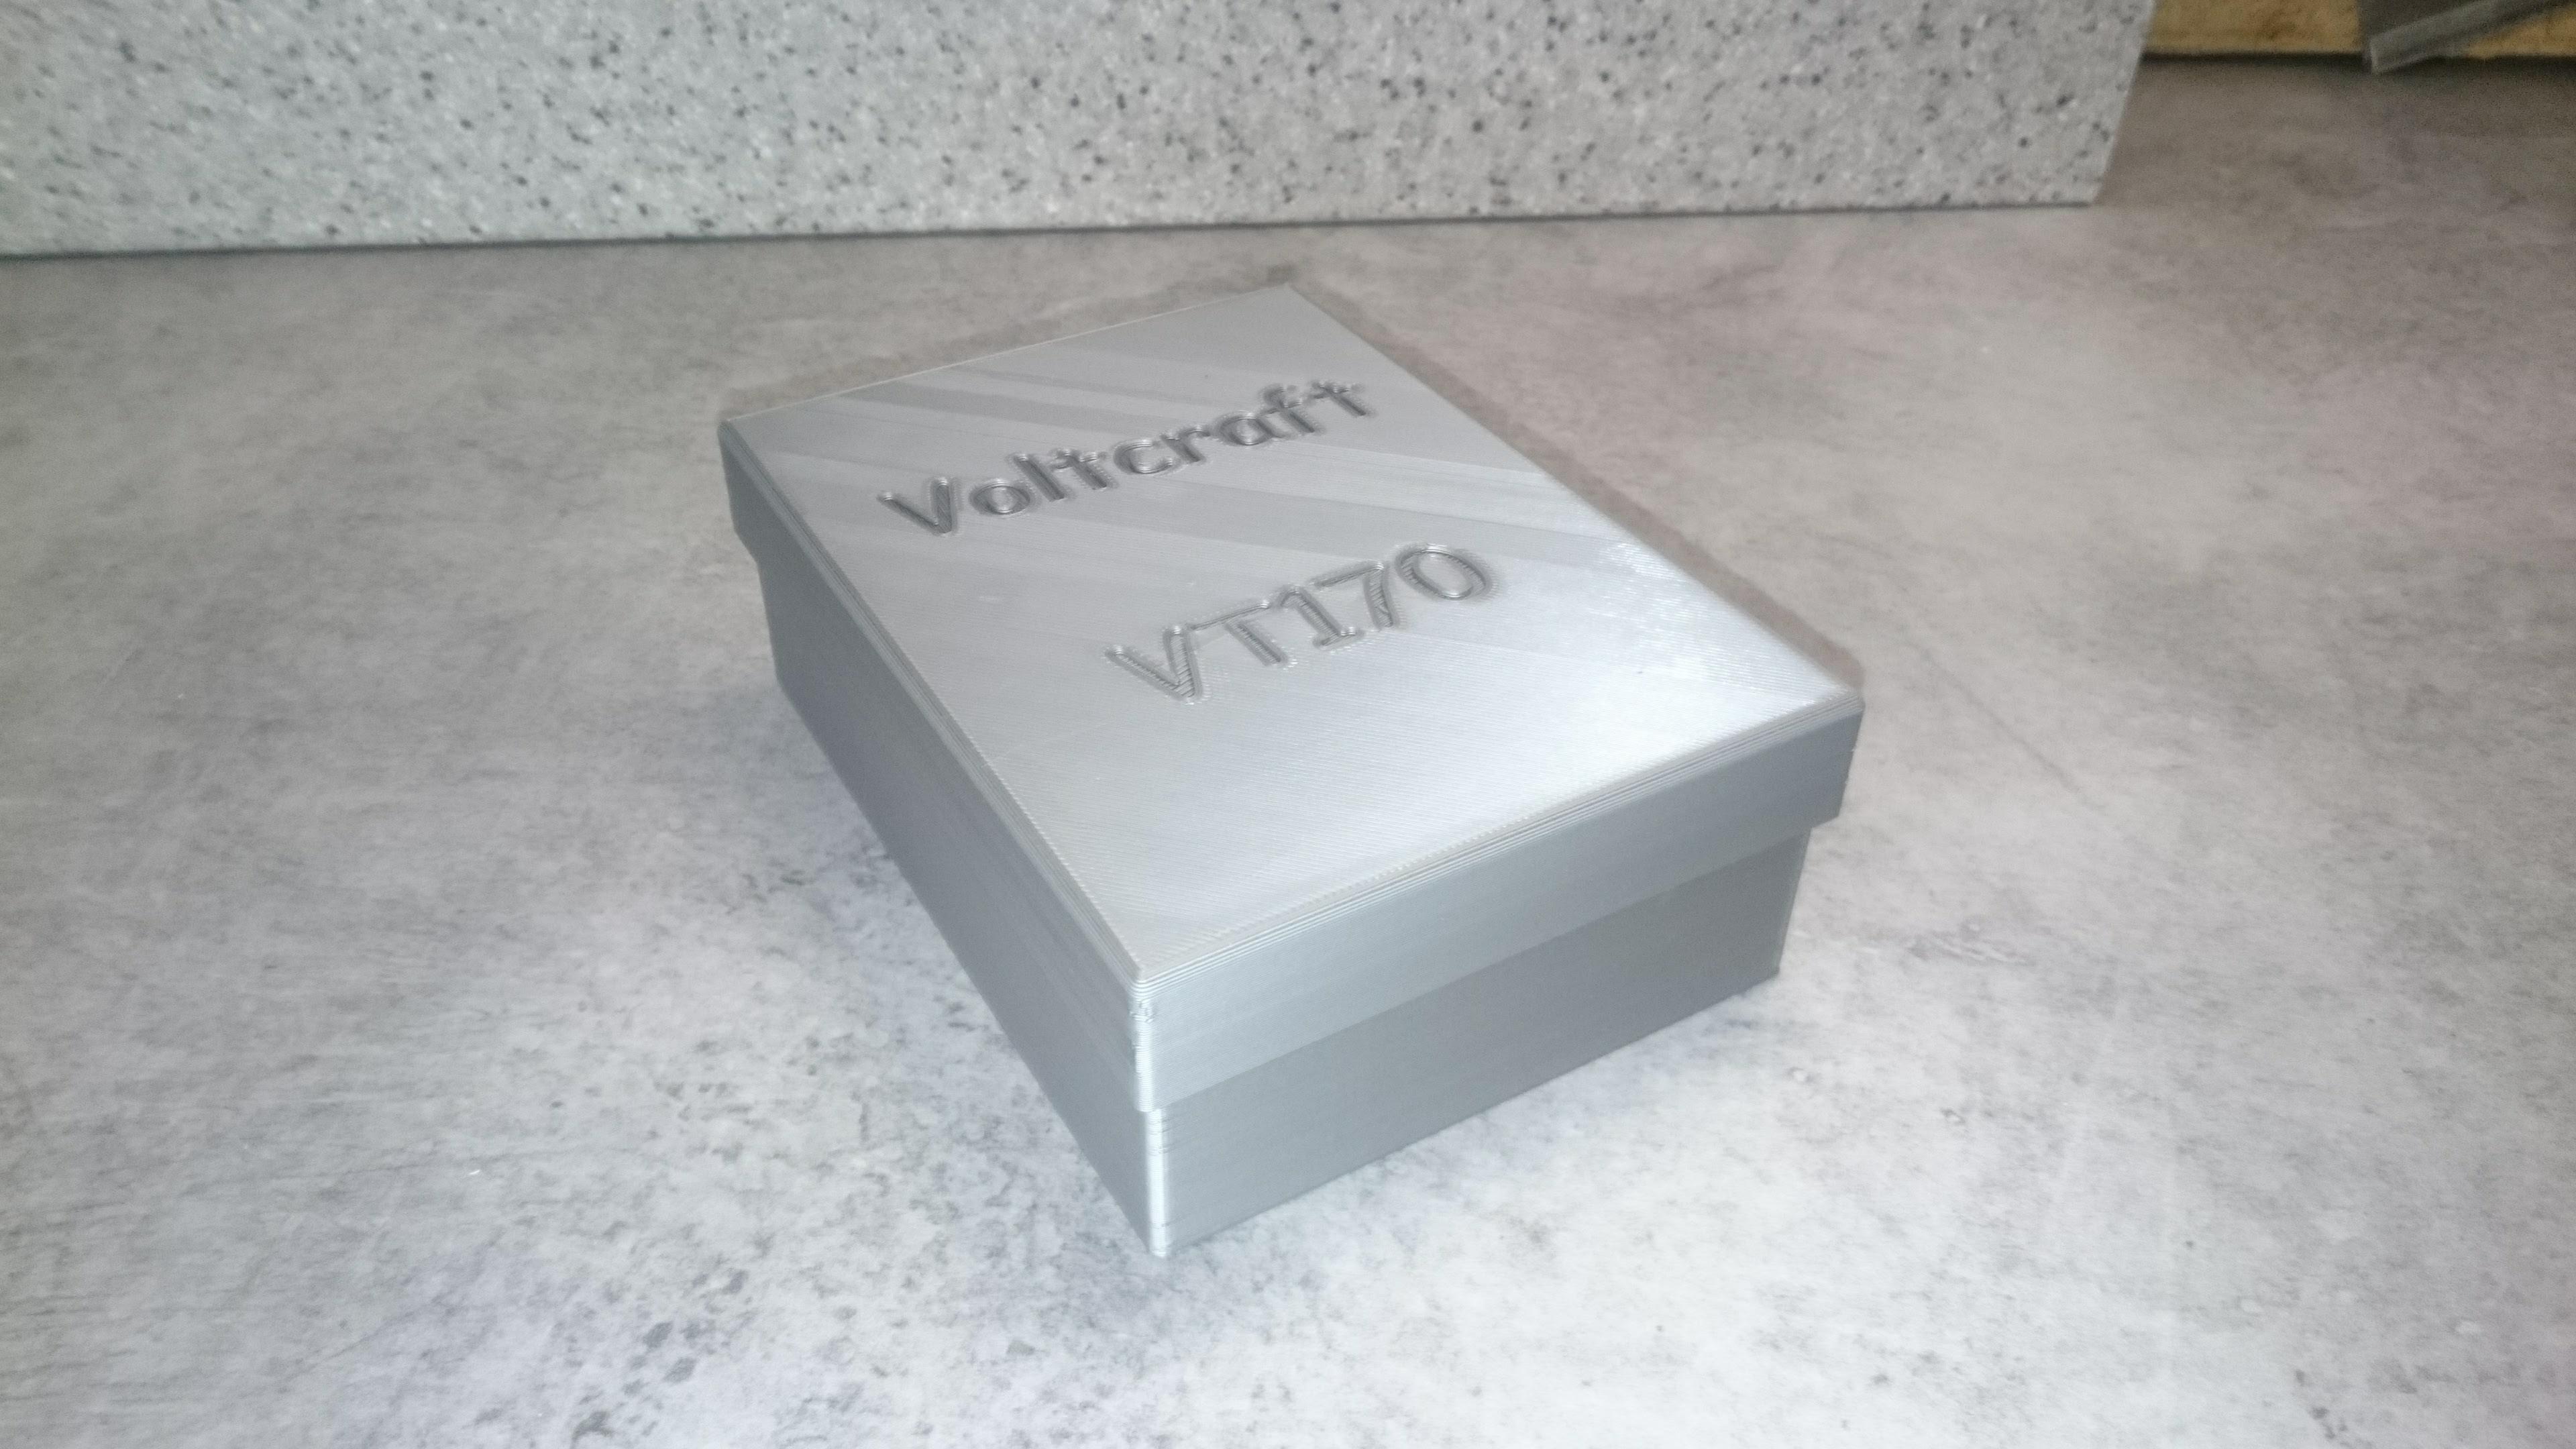 Voltcraft VC170 03.jpg Download free STL file Box for Voltmeter • 3D print template, Ldom21